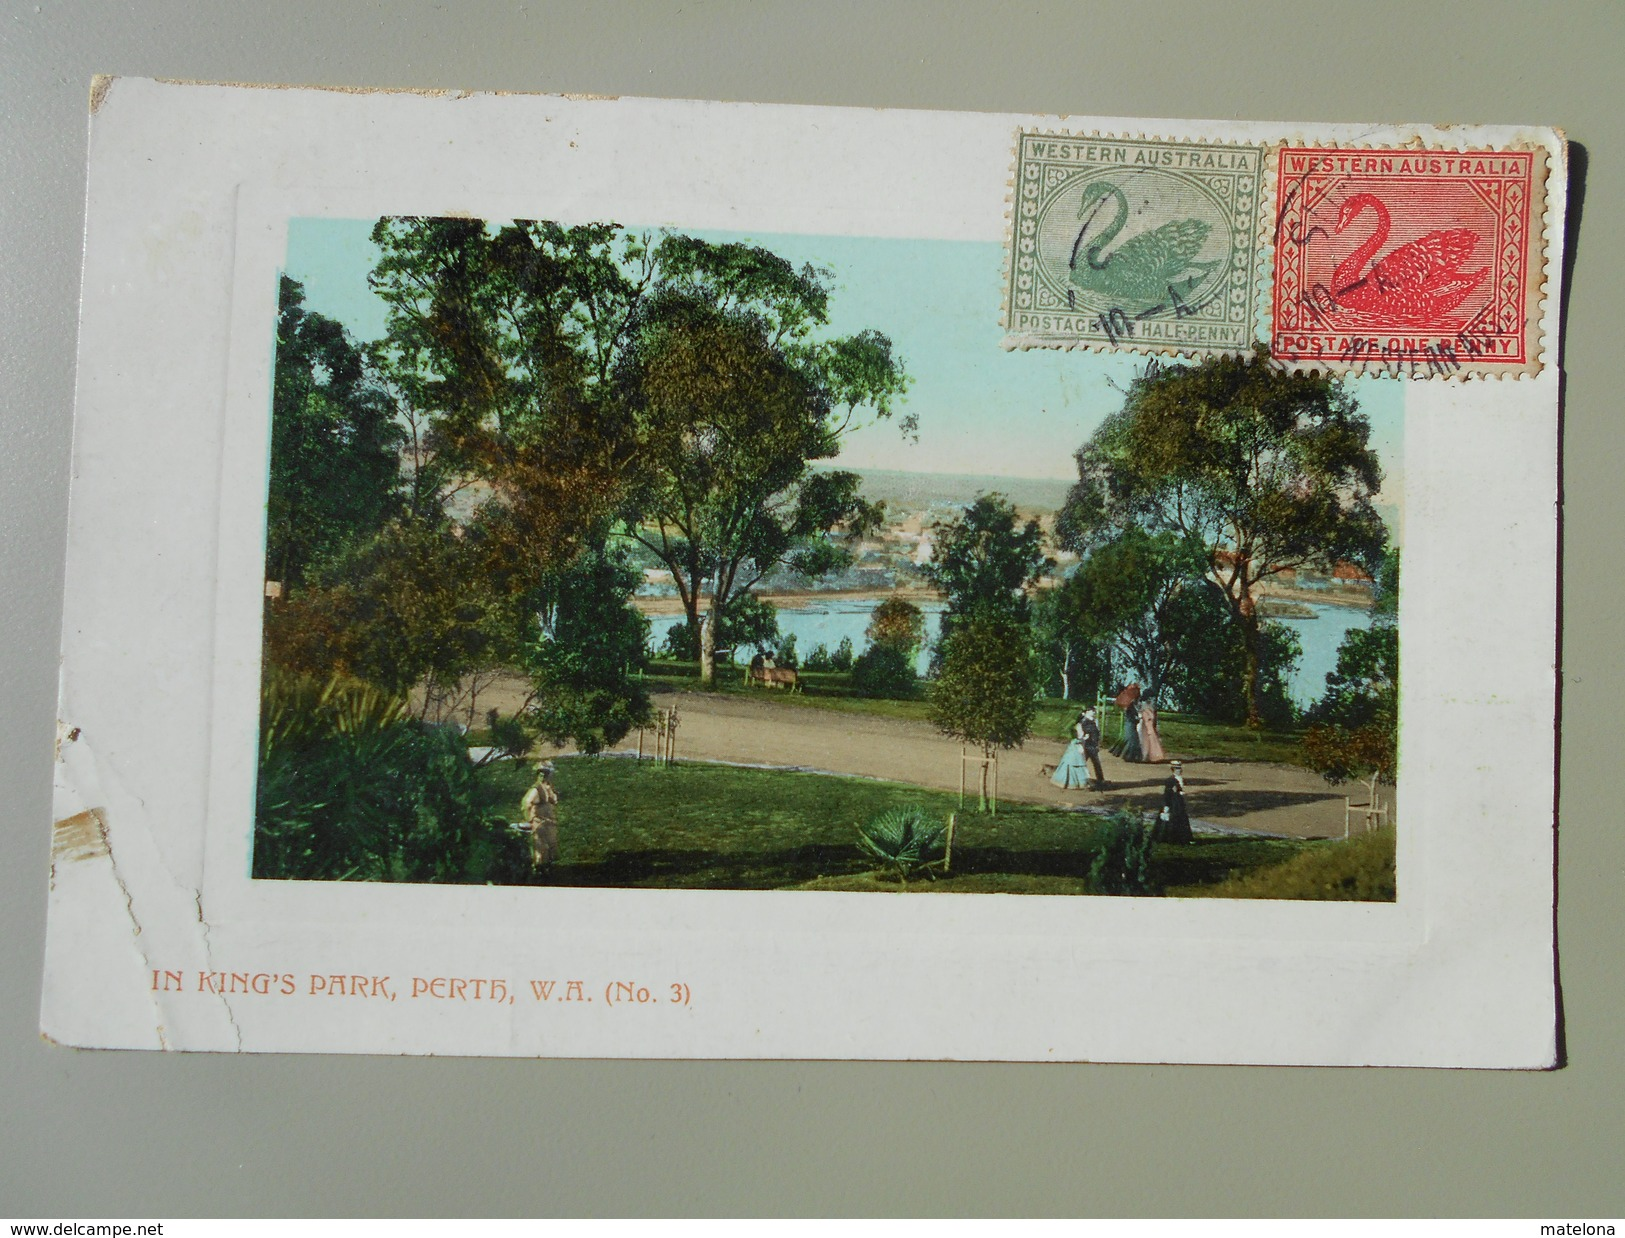 AUSTRALIE WESTERN AUSTRALIA PERTH IN KING'S PARK No 3 - Perth